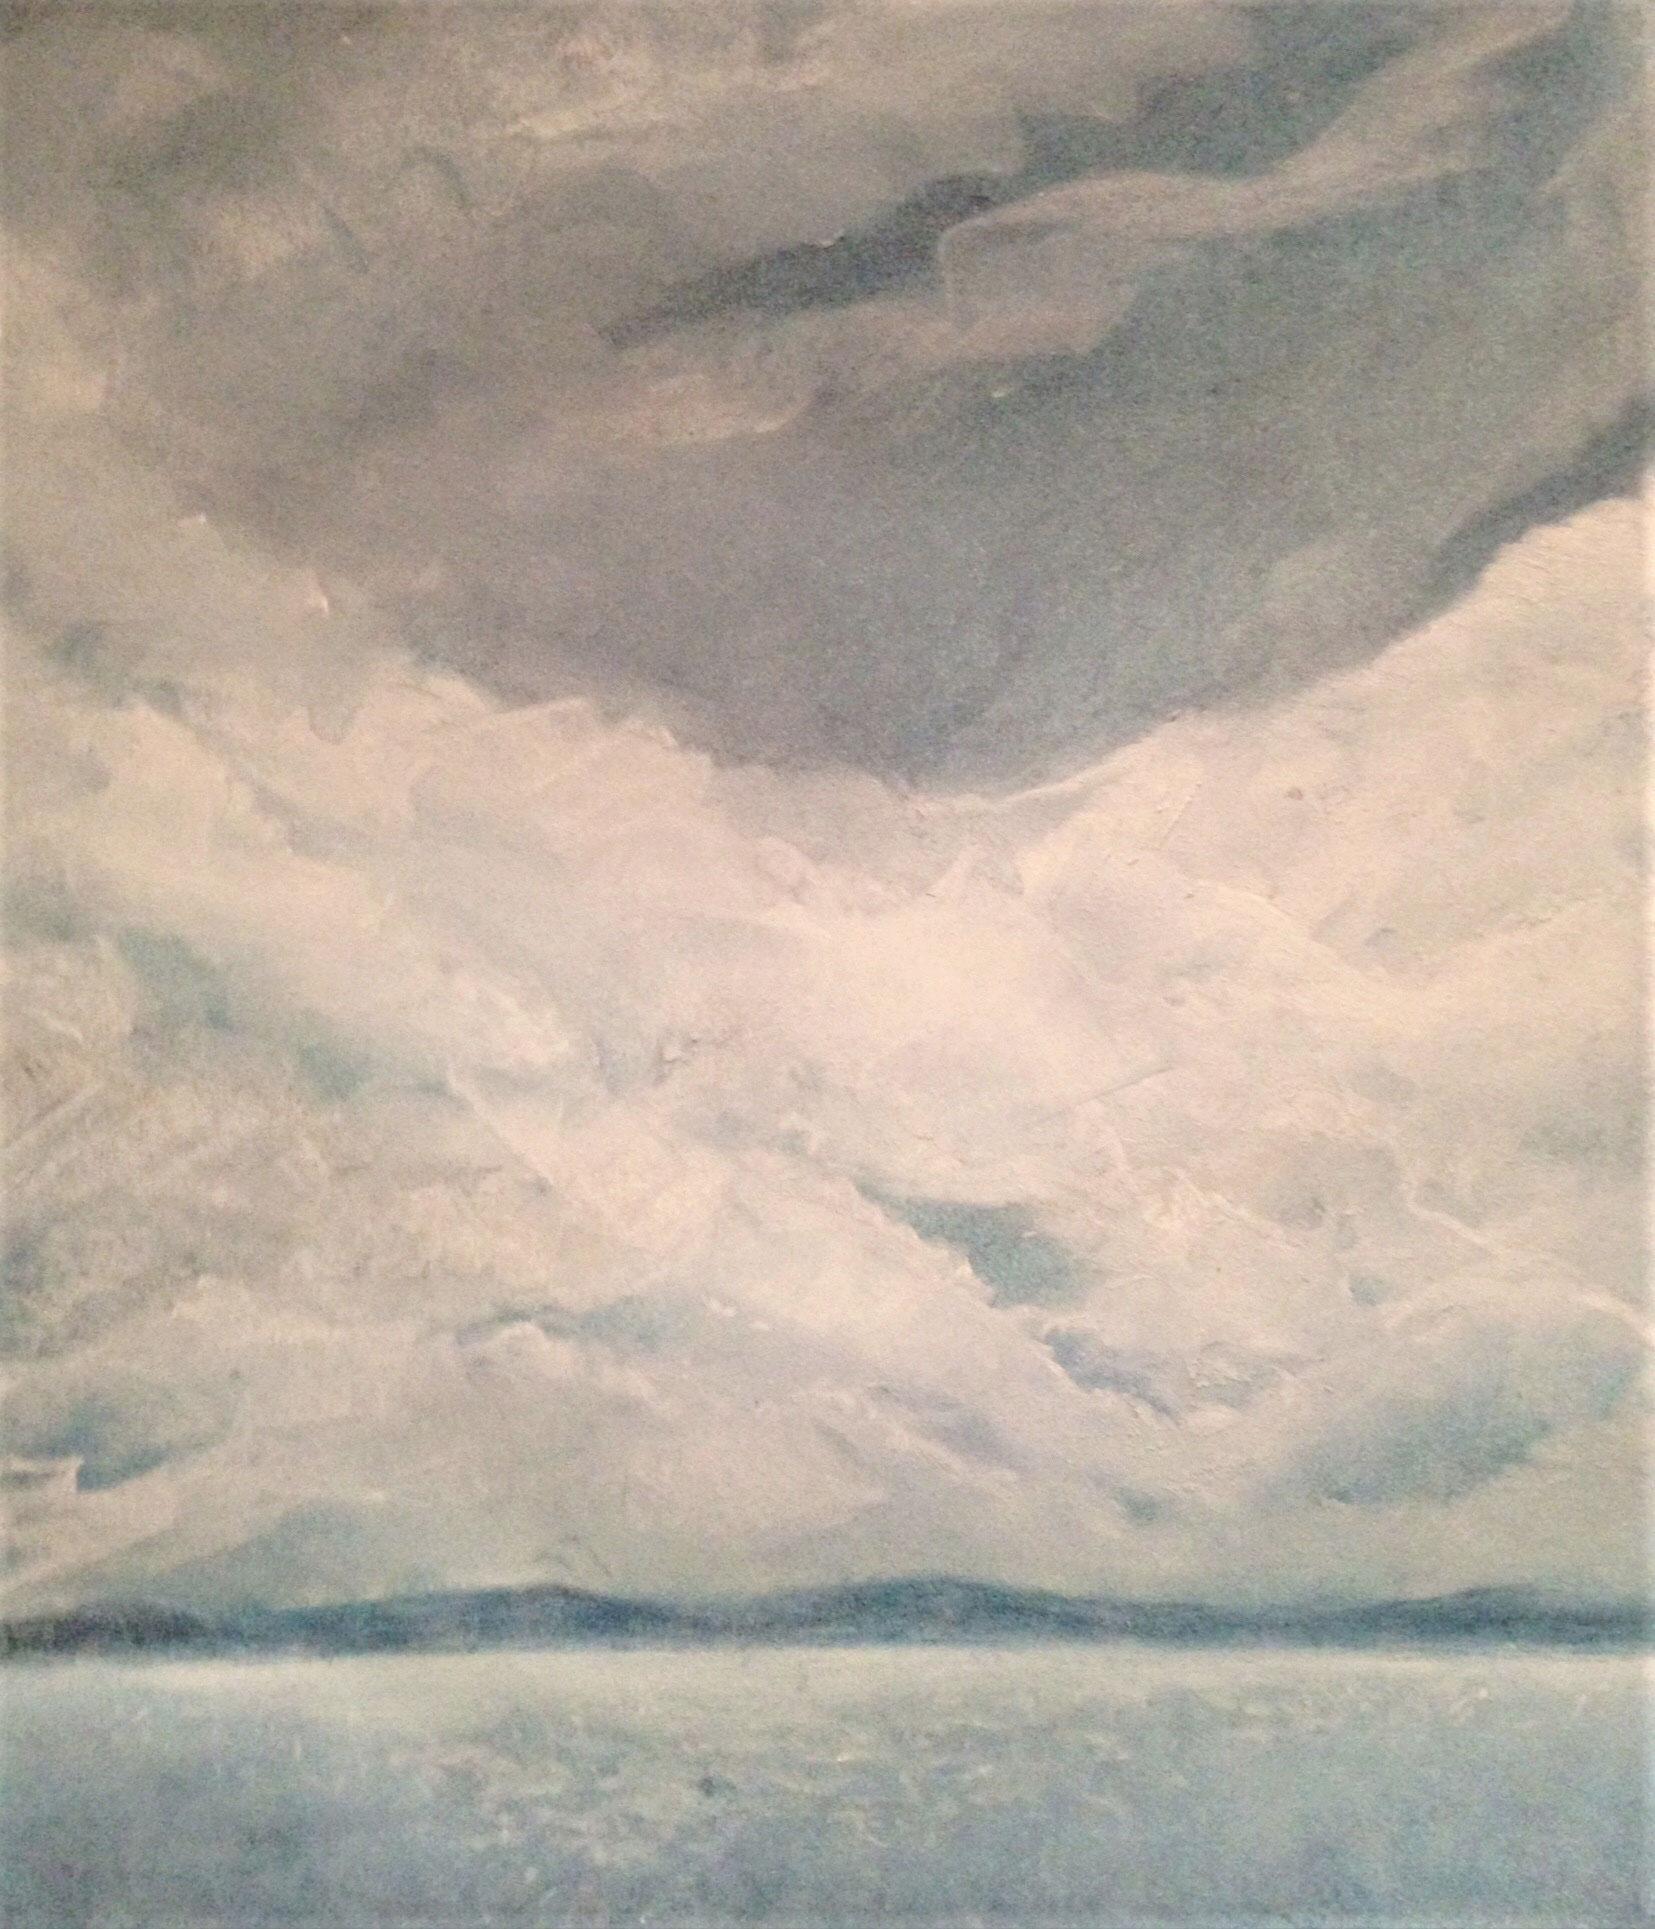 "Seascape V   2014 16"" x 12"" (40.6 x 30.5 cm) soft pastel on paper"